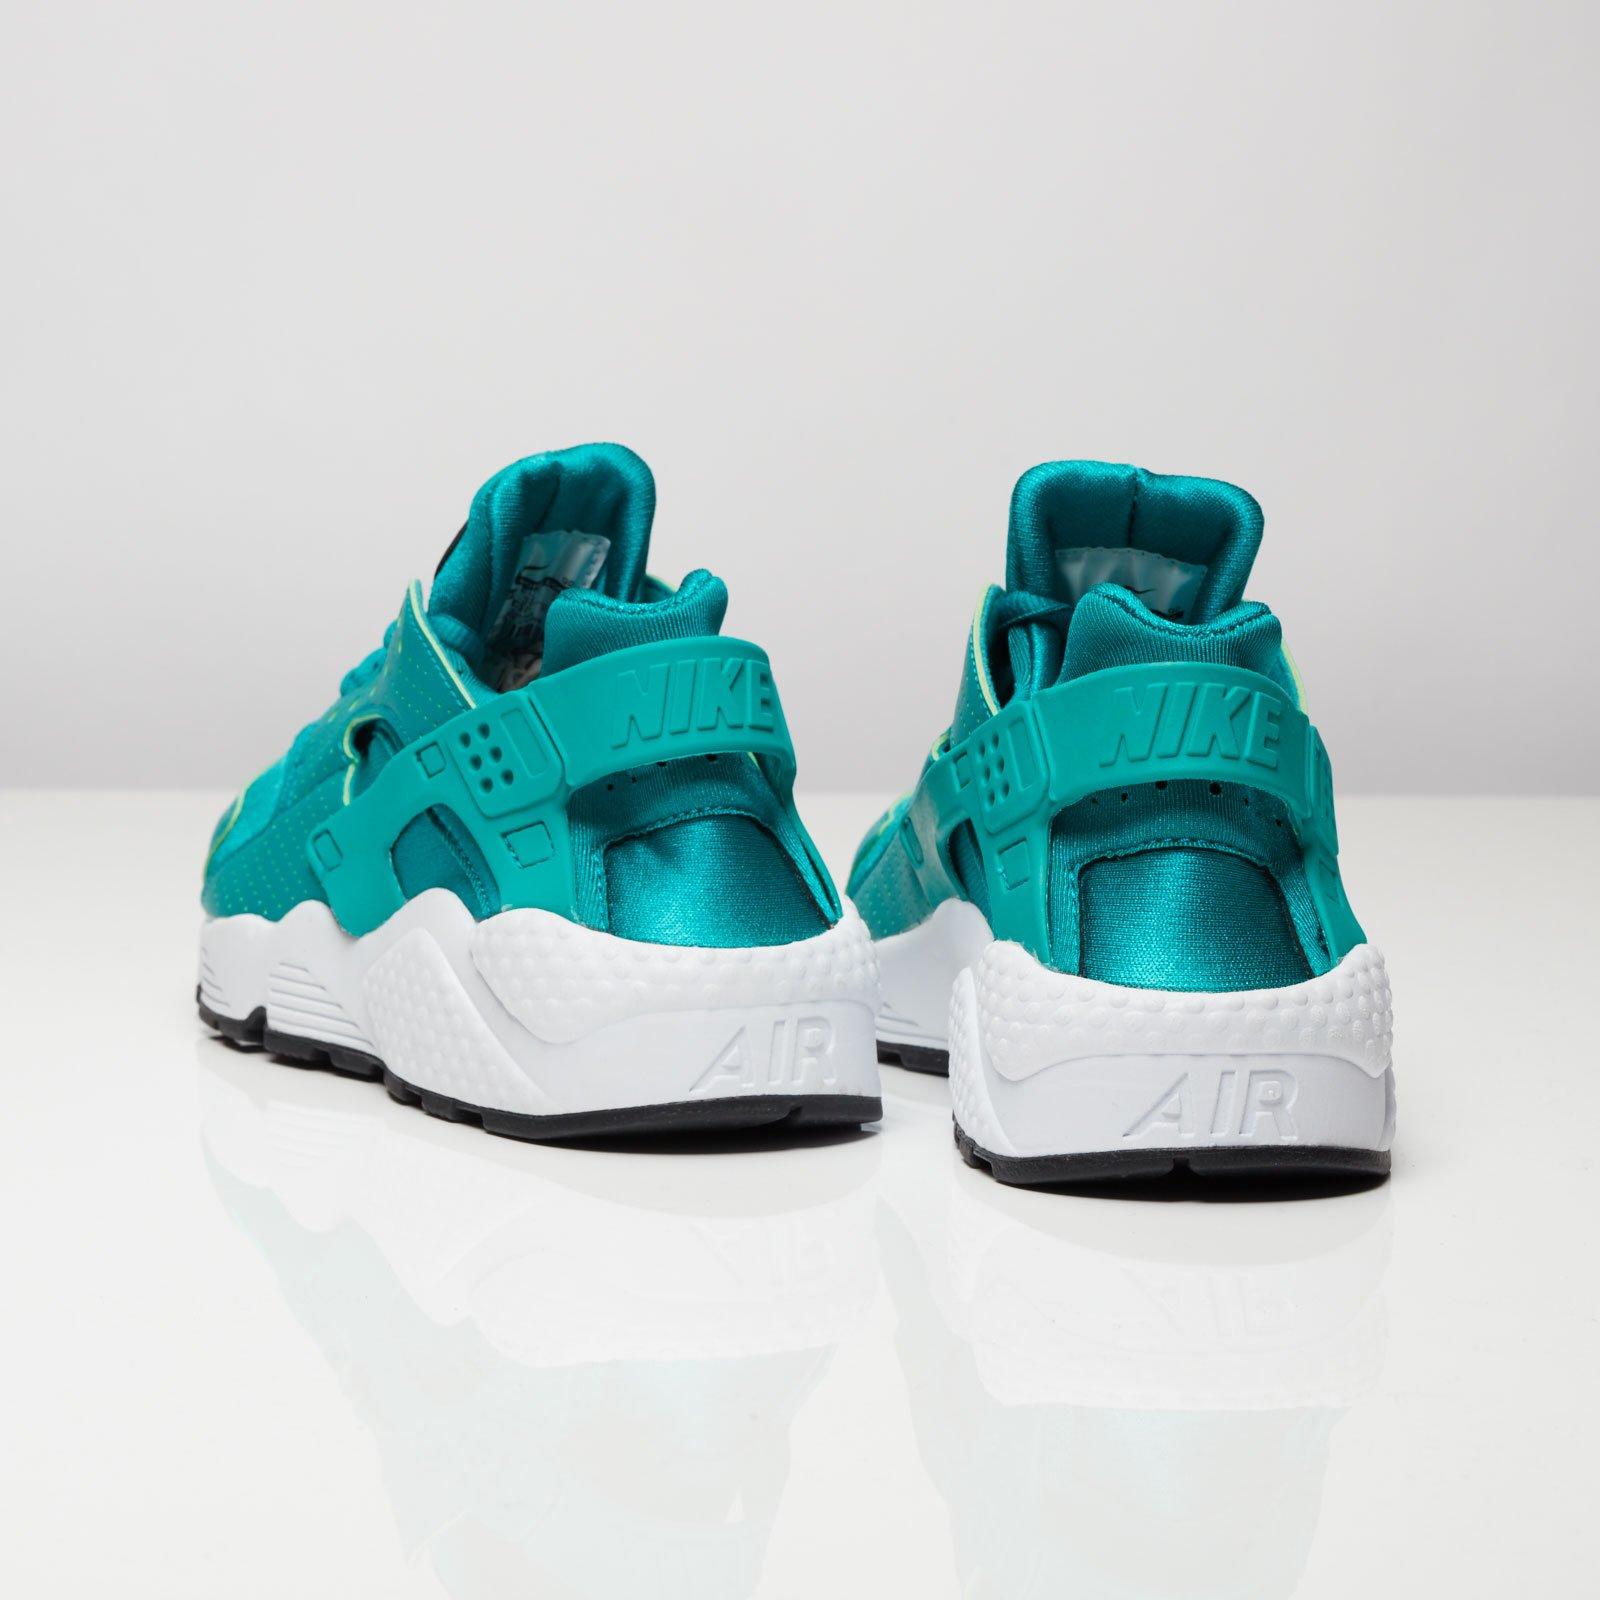 official photos ebf62 fdfc8 Nike Wmns Air Huarache Run - 634835-301 - Sneakersnstuff   sneakers    streetwear online since 1999